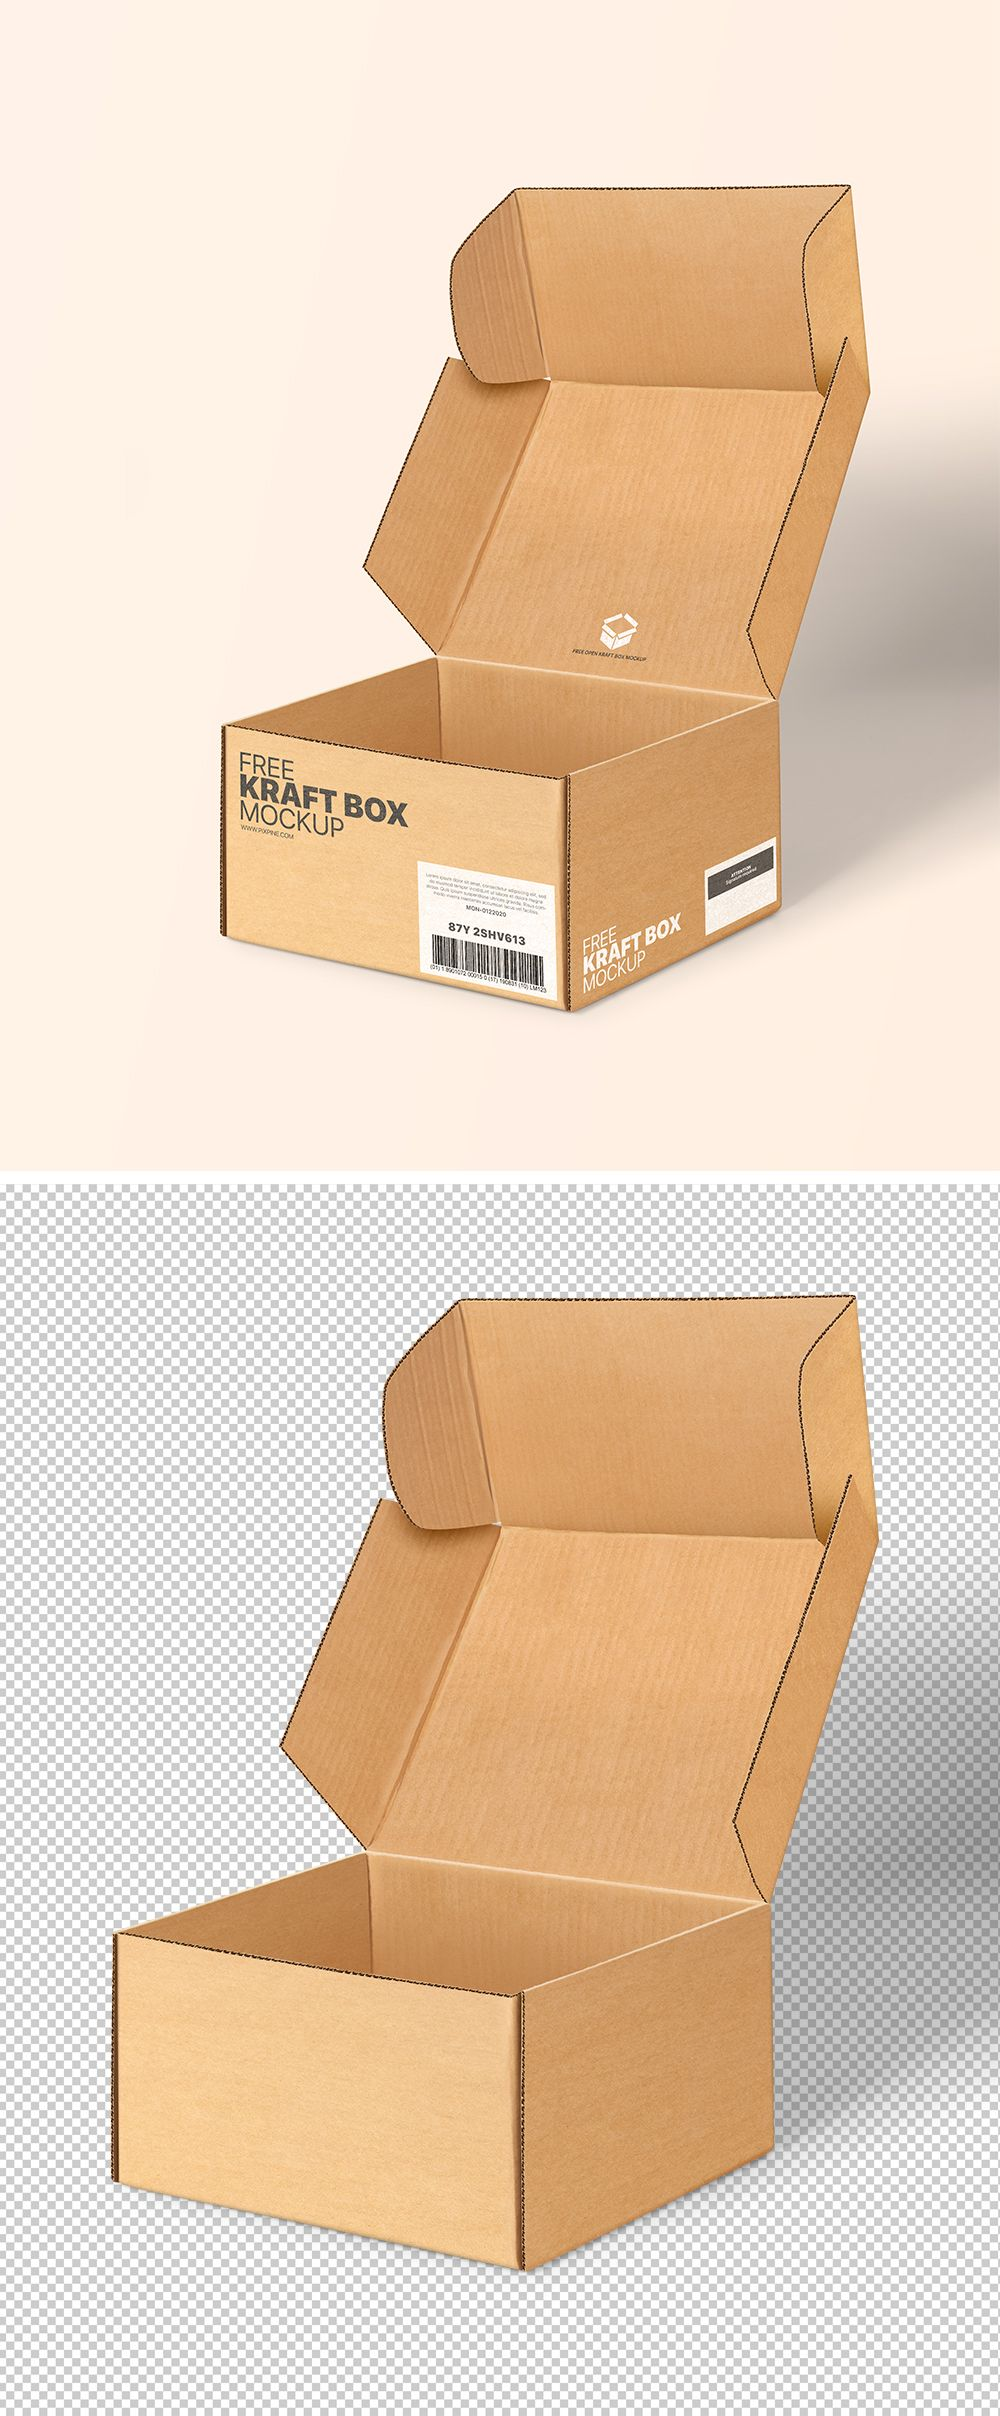 Download Free Open Kraft Box Mockup Free Mockups Pixpine Box Mockup Kraft Boxes Free Opening